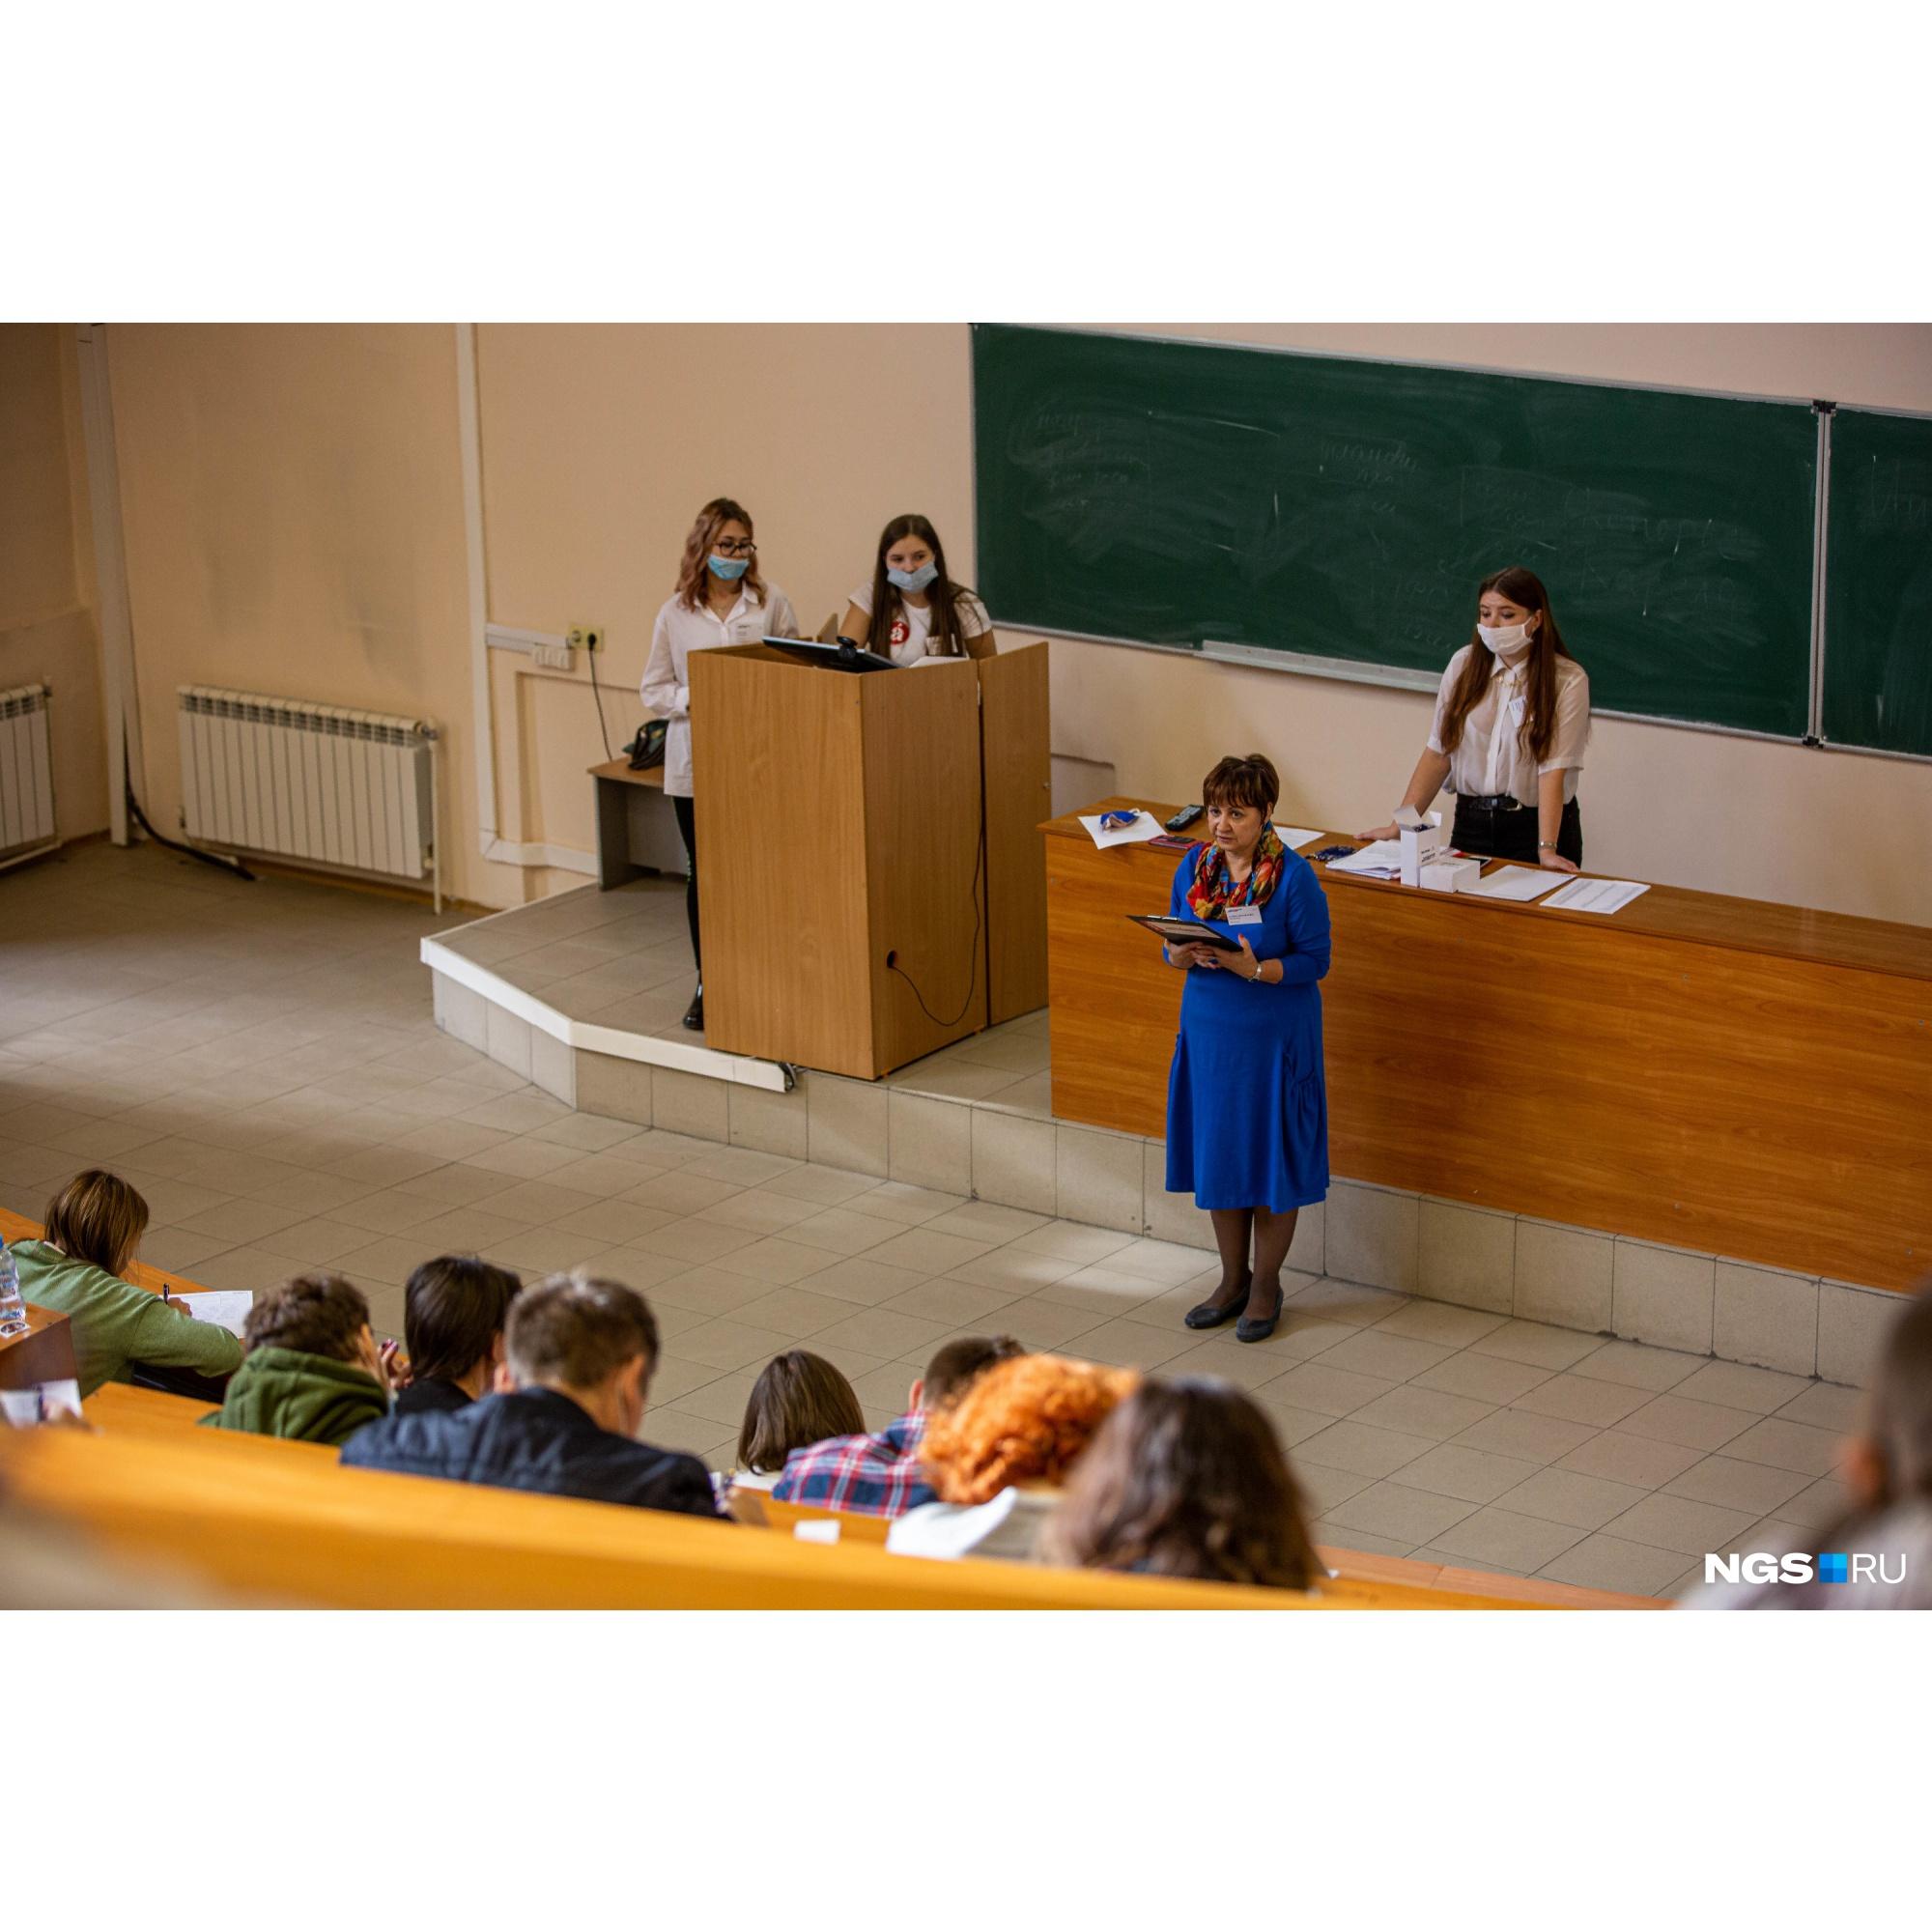 Текст диктанта читали преподаватели кафедры филологии